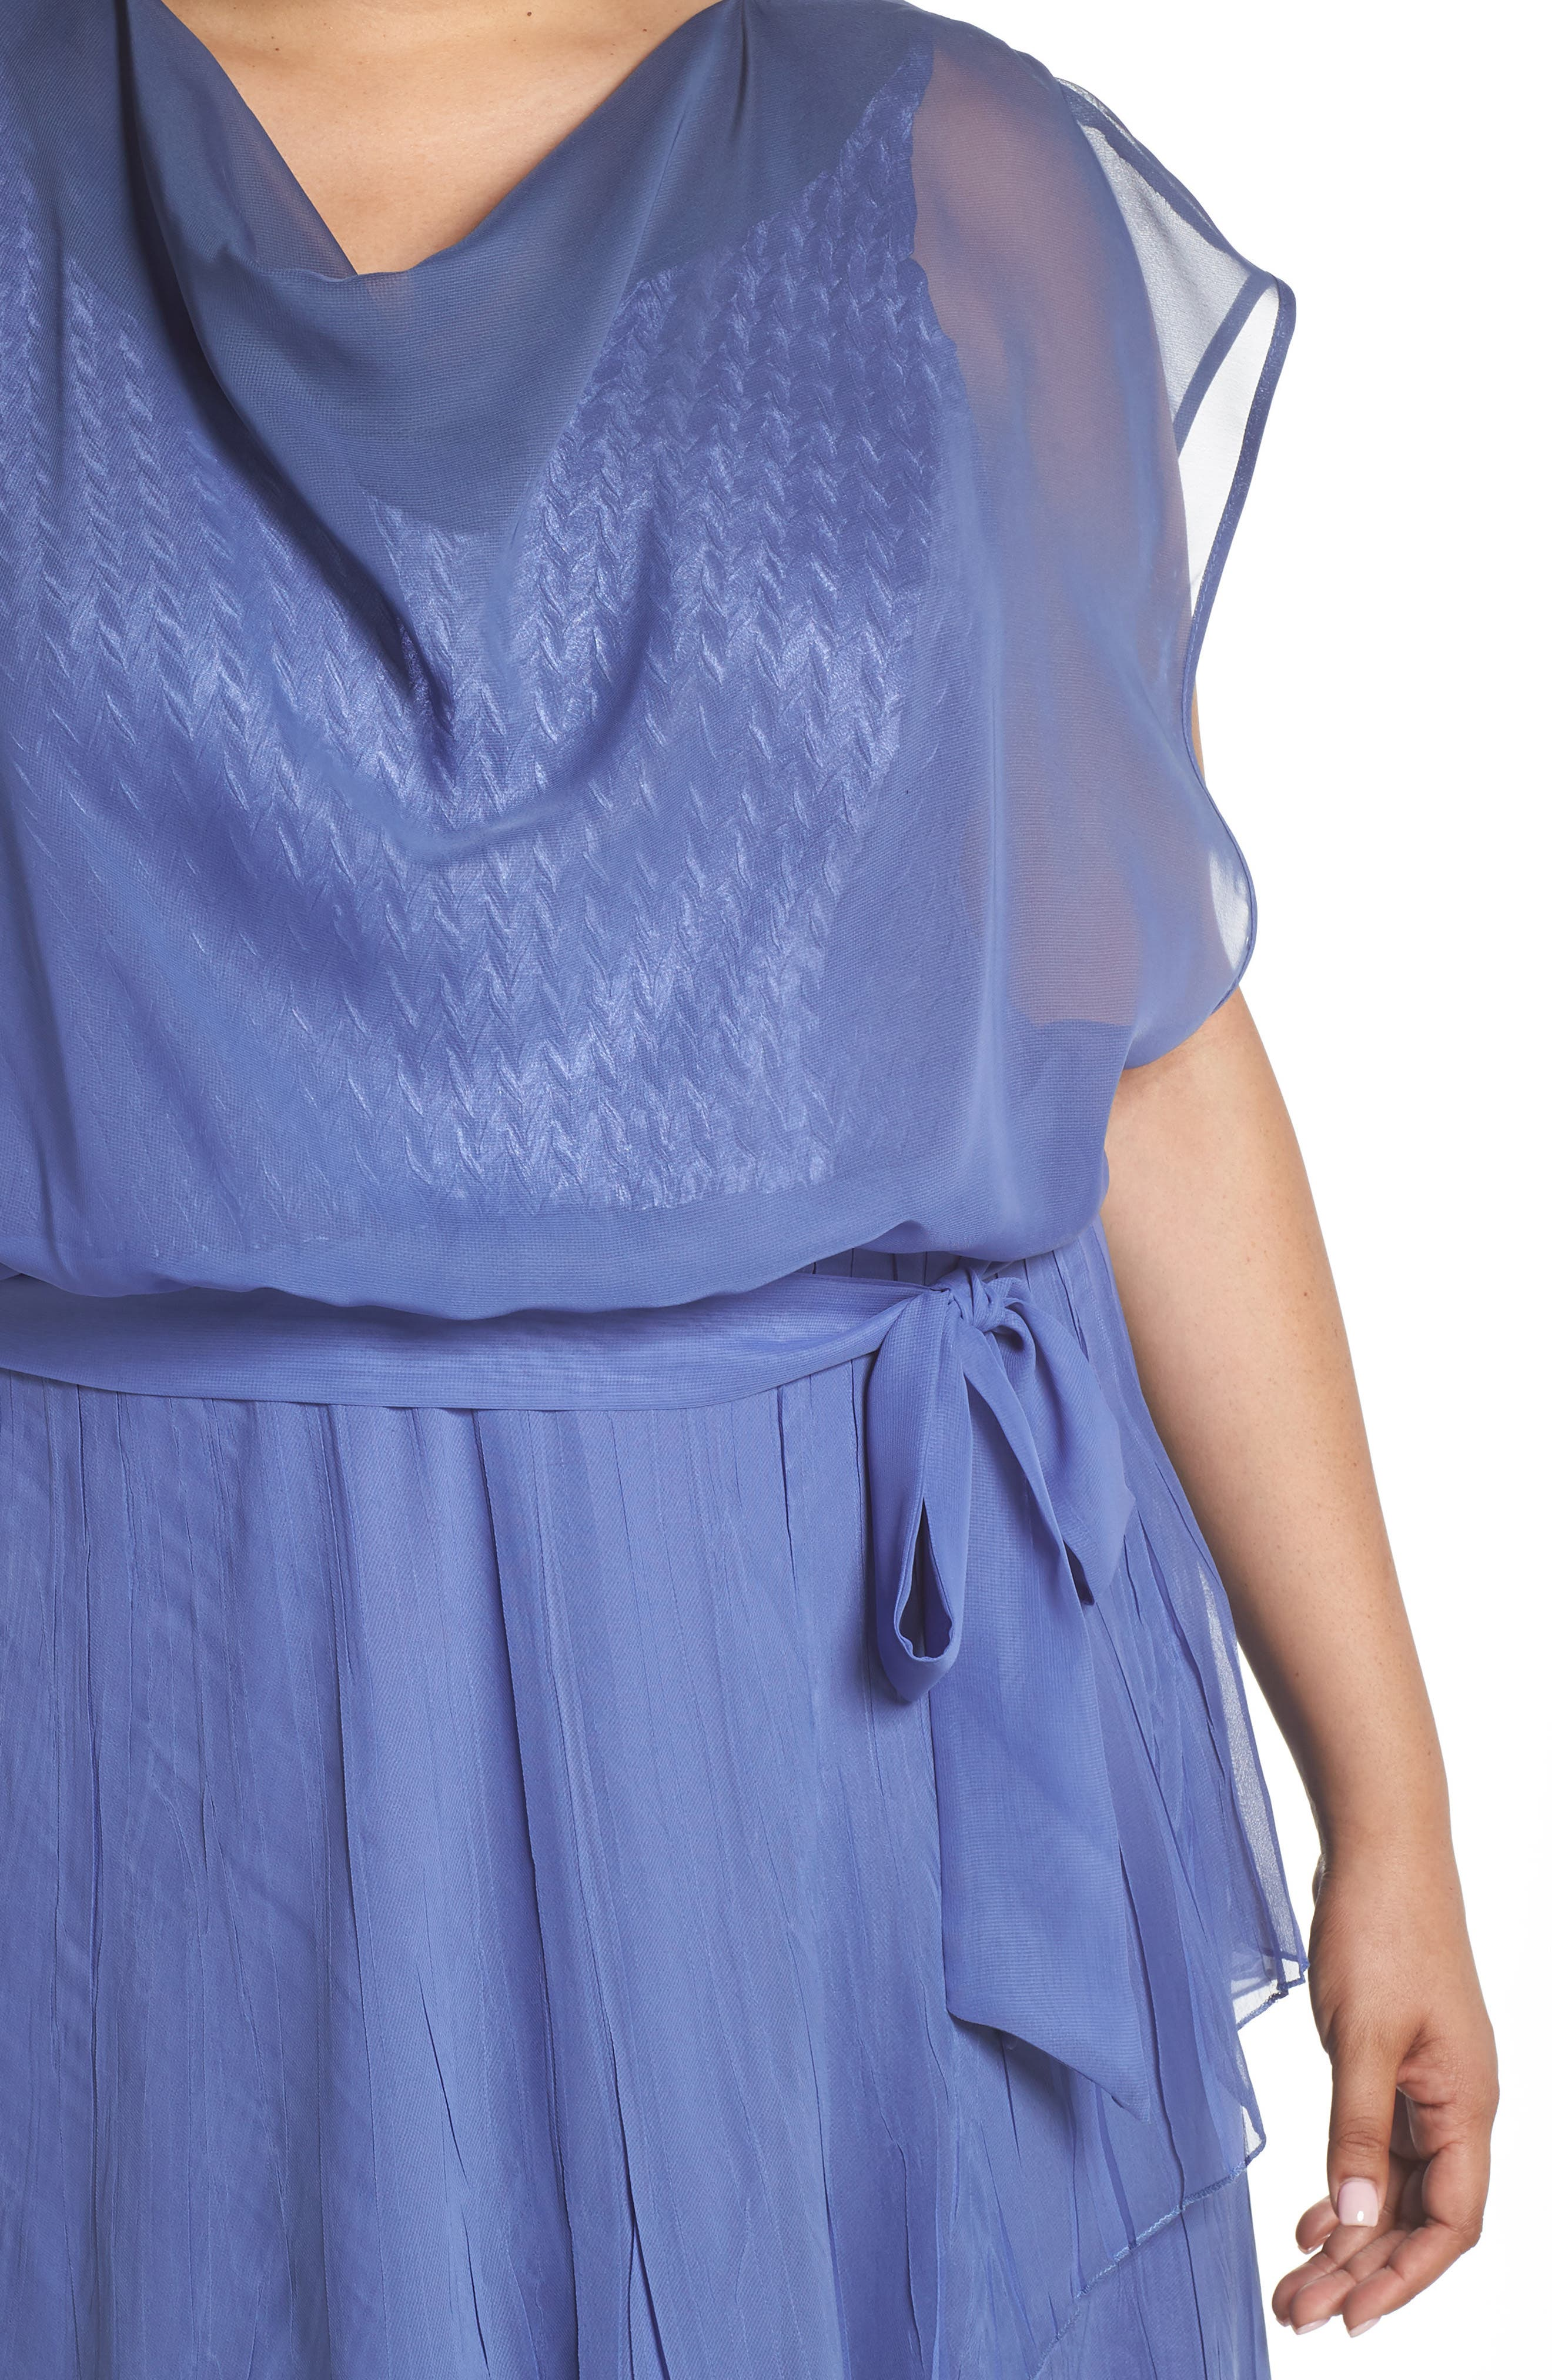 Charmeuse & Chiffon Blouson Dress,                             Alternate thumbnail 4, color,                             Fregatta Blue Ombre